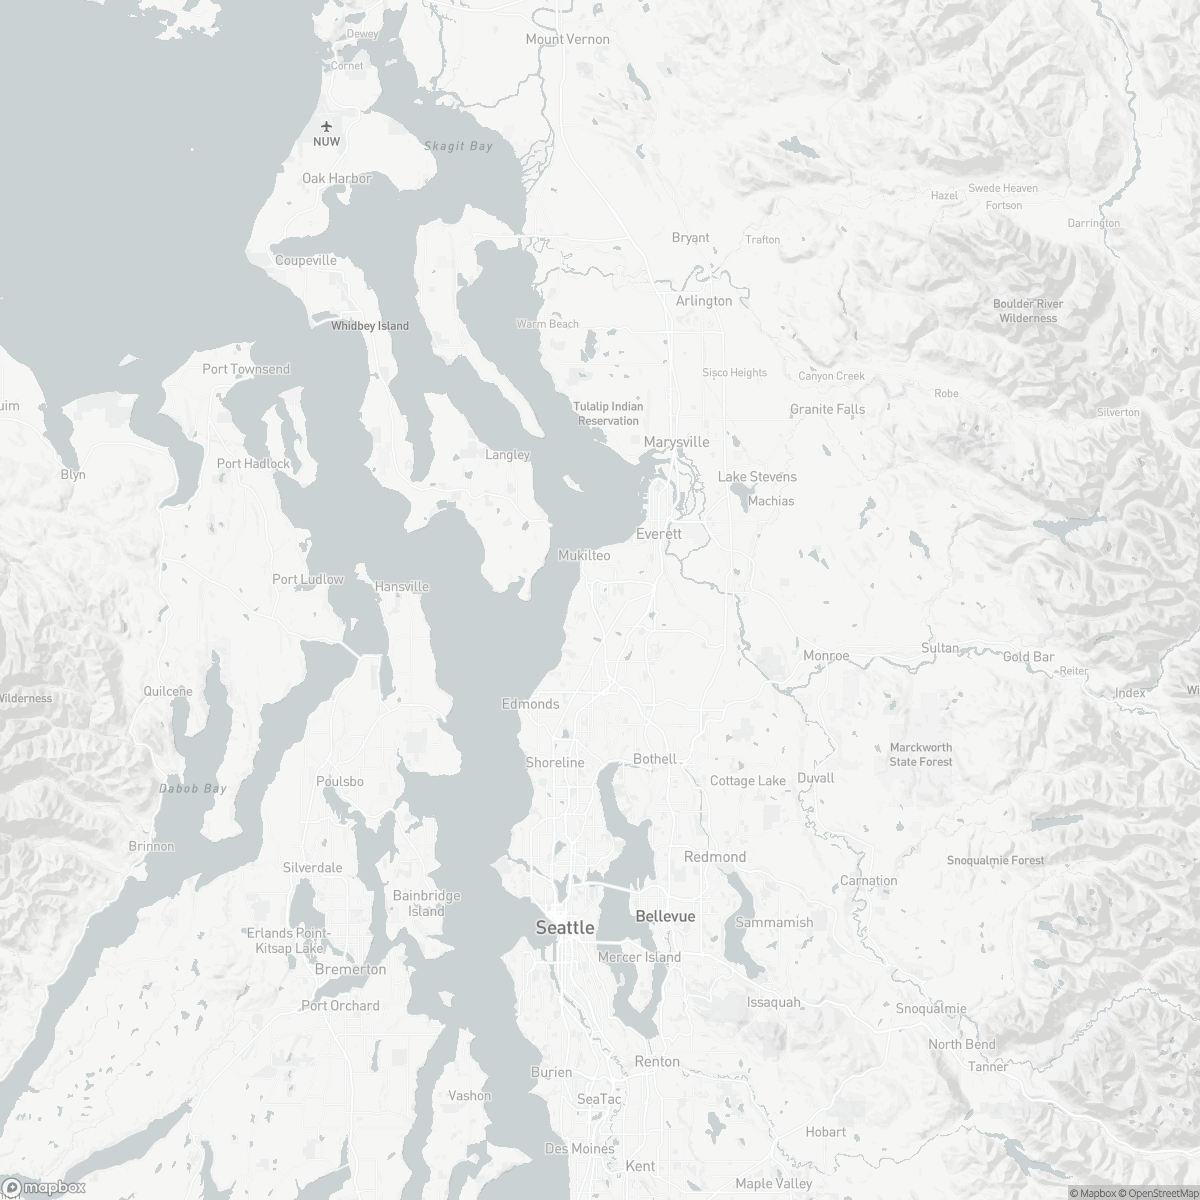 Map of Paine Field Airport PAE surrounding area of Everett Washington